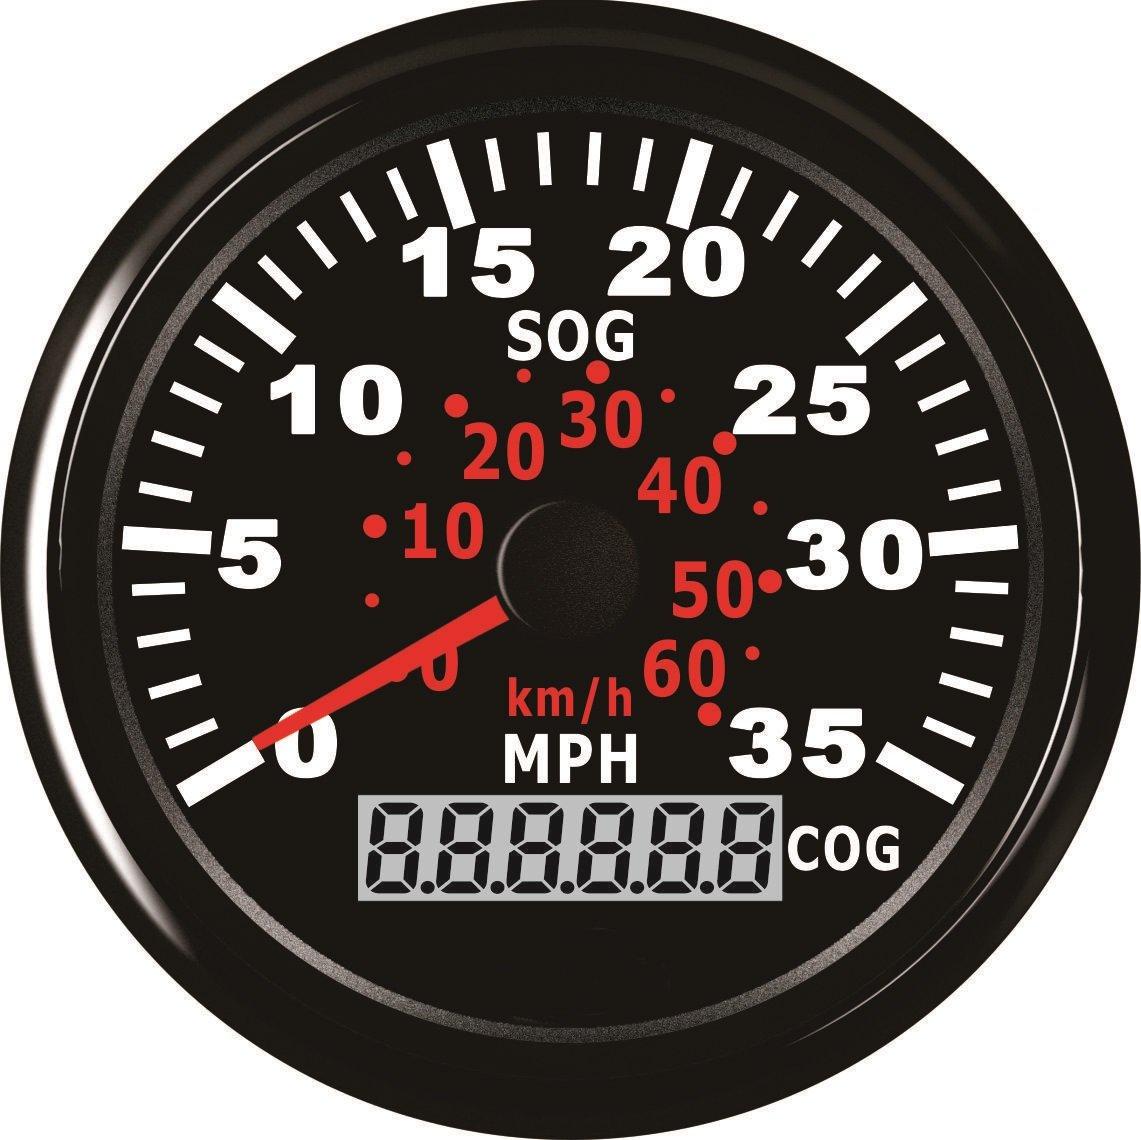 GPS tachimetro Speedo gauge 0 –  35 mph per barca yacht nave da 3 –  3/20, 3 cm (85 mm) 9 –  32 V 3cm (85mm) 9-32V ELING